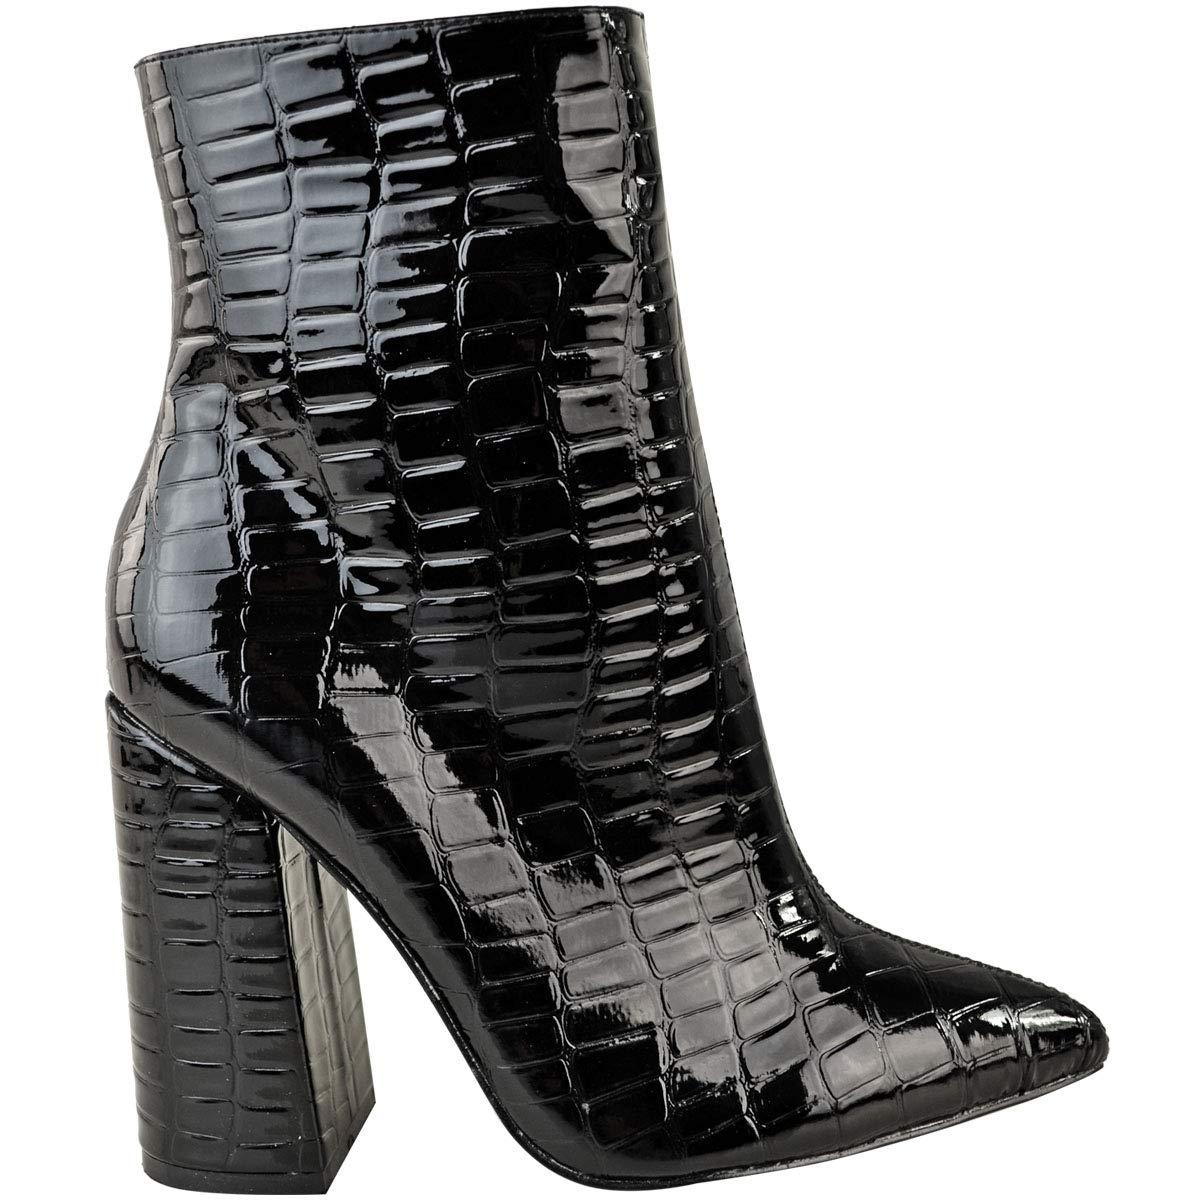 c8e8bd57e4b2 Womens Ladies Block High Heel Ankle Boots Black Croc Smart Work Animal  Print Heelberry®  Amazon.co.uk  Shoes   Bags